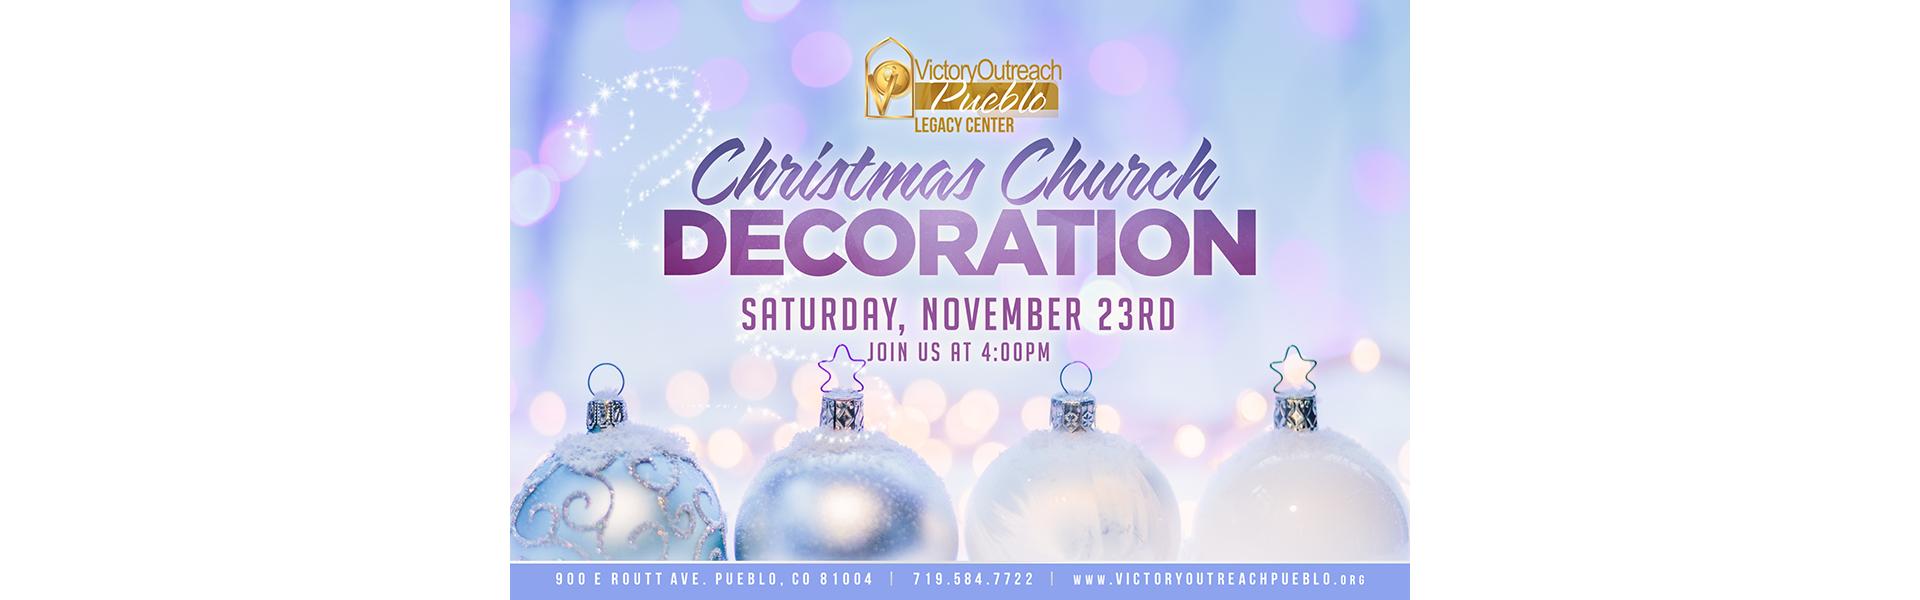 Christmas Church Decoration Nov 23